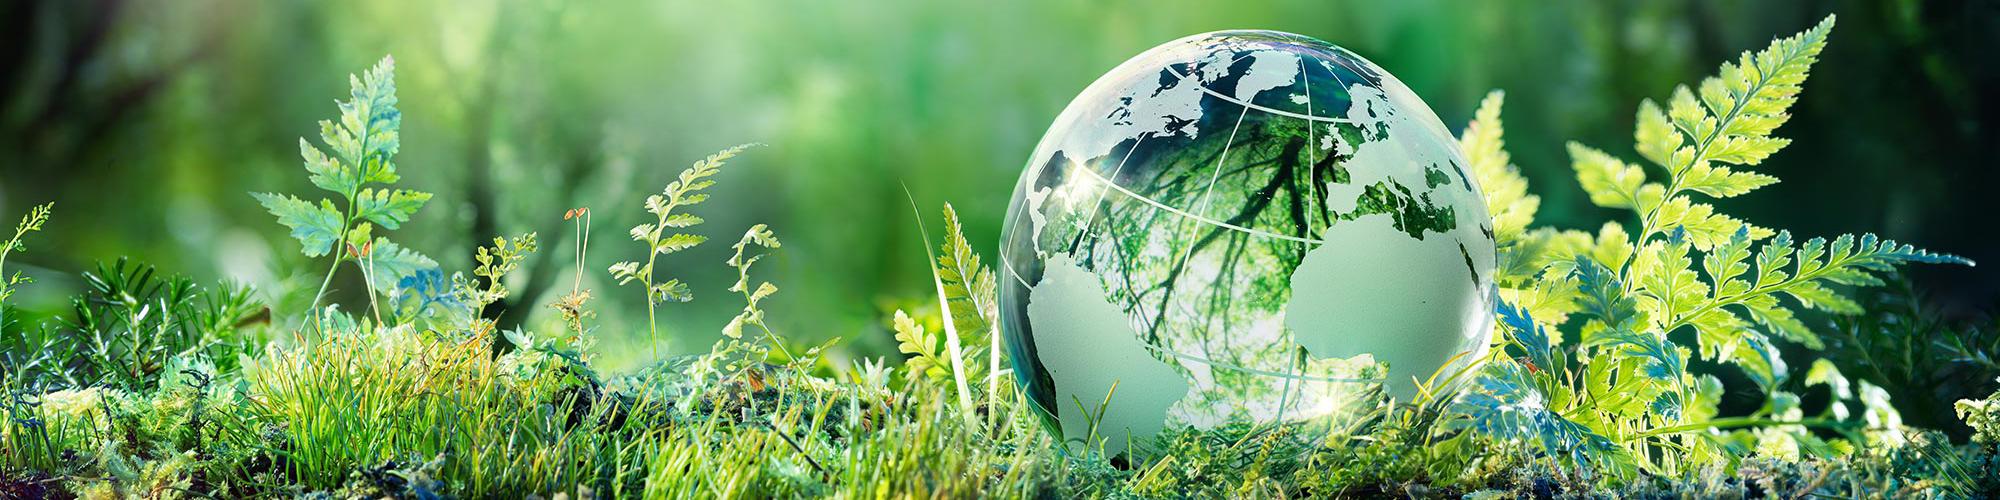 Glass globe sitting in grass.